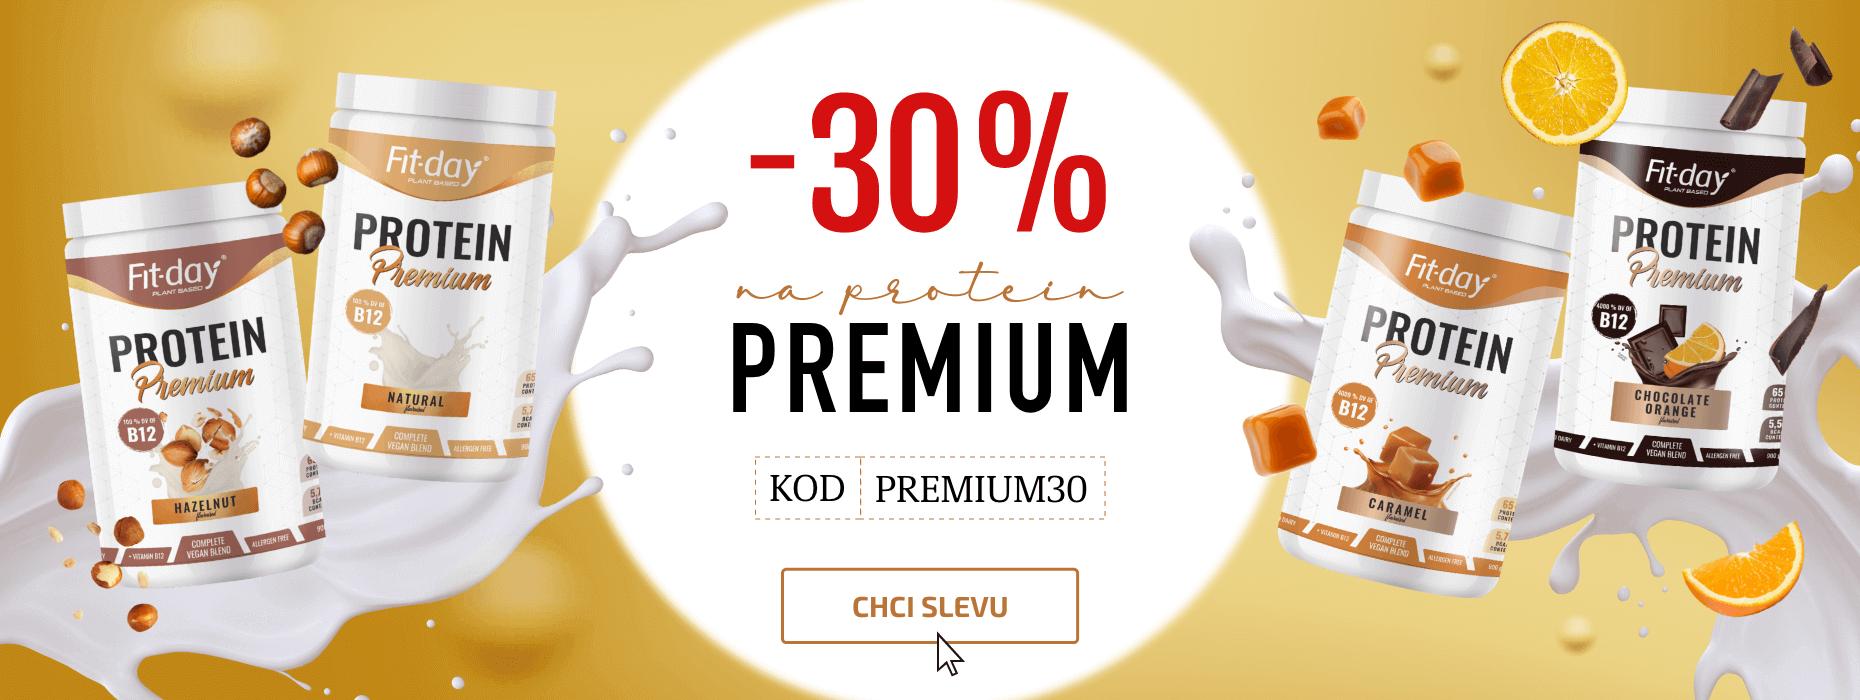 Získej prémiový drink o 30 % levněji!